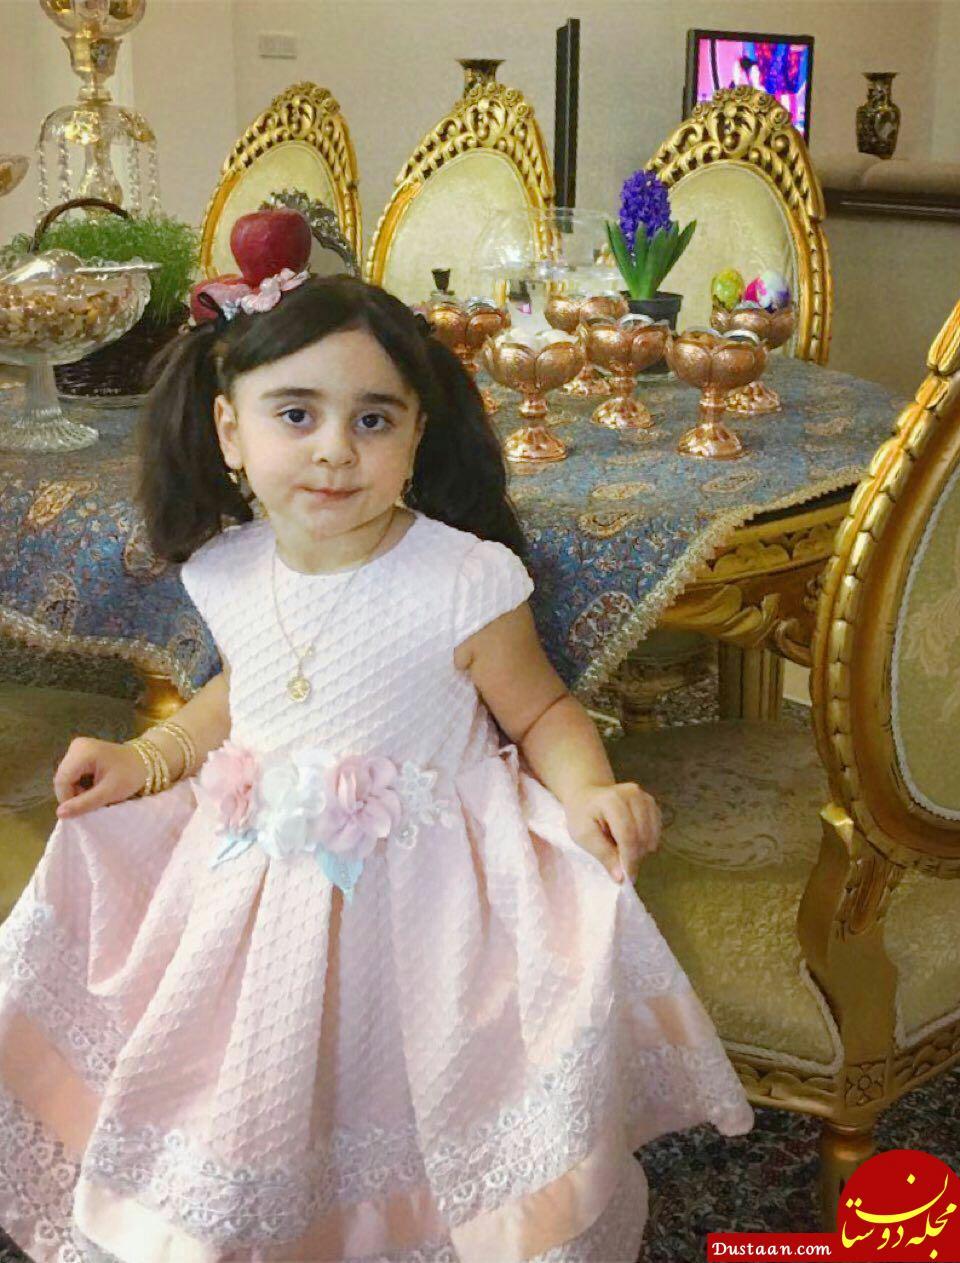 www.dustaan.com - فیلم دوربین مدار بسته که به داد دختر ۴ ساله رسید! +فیلم